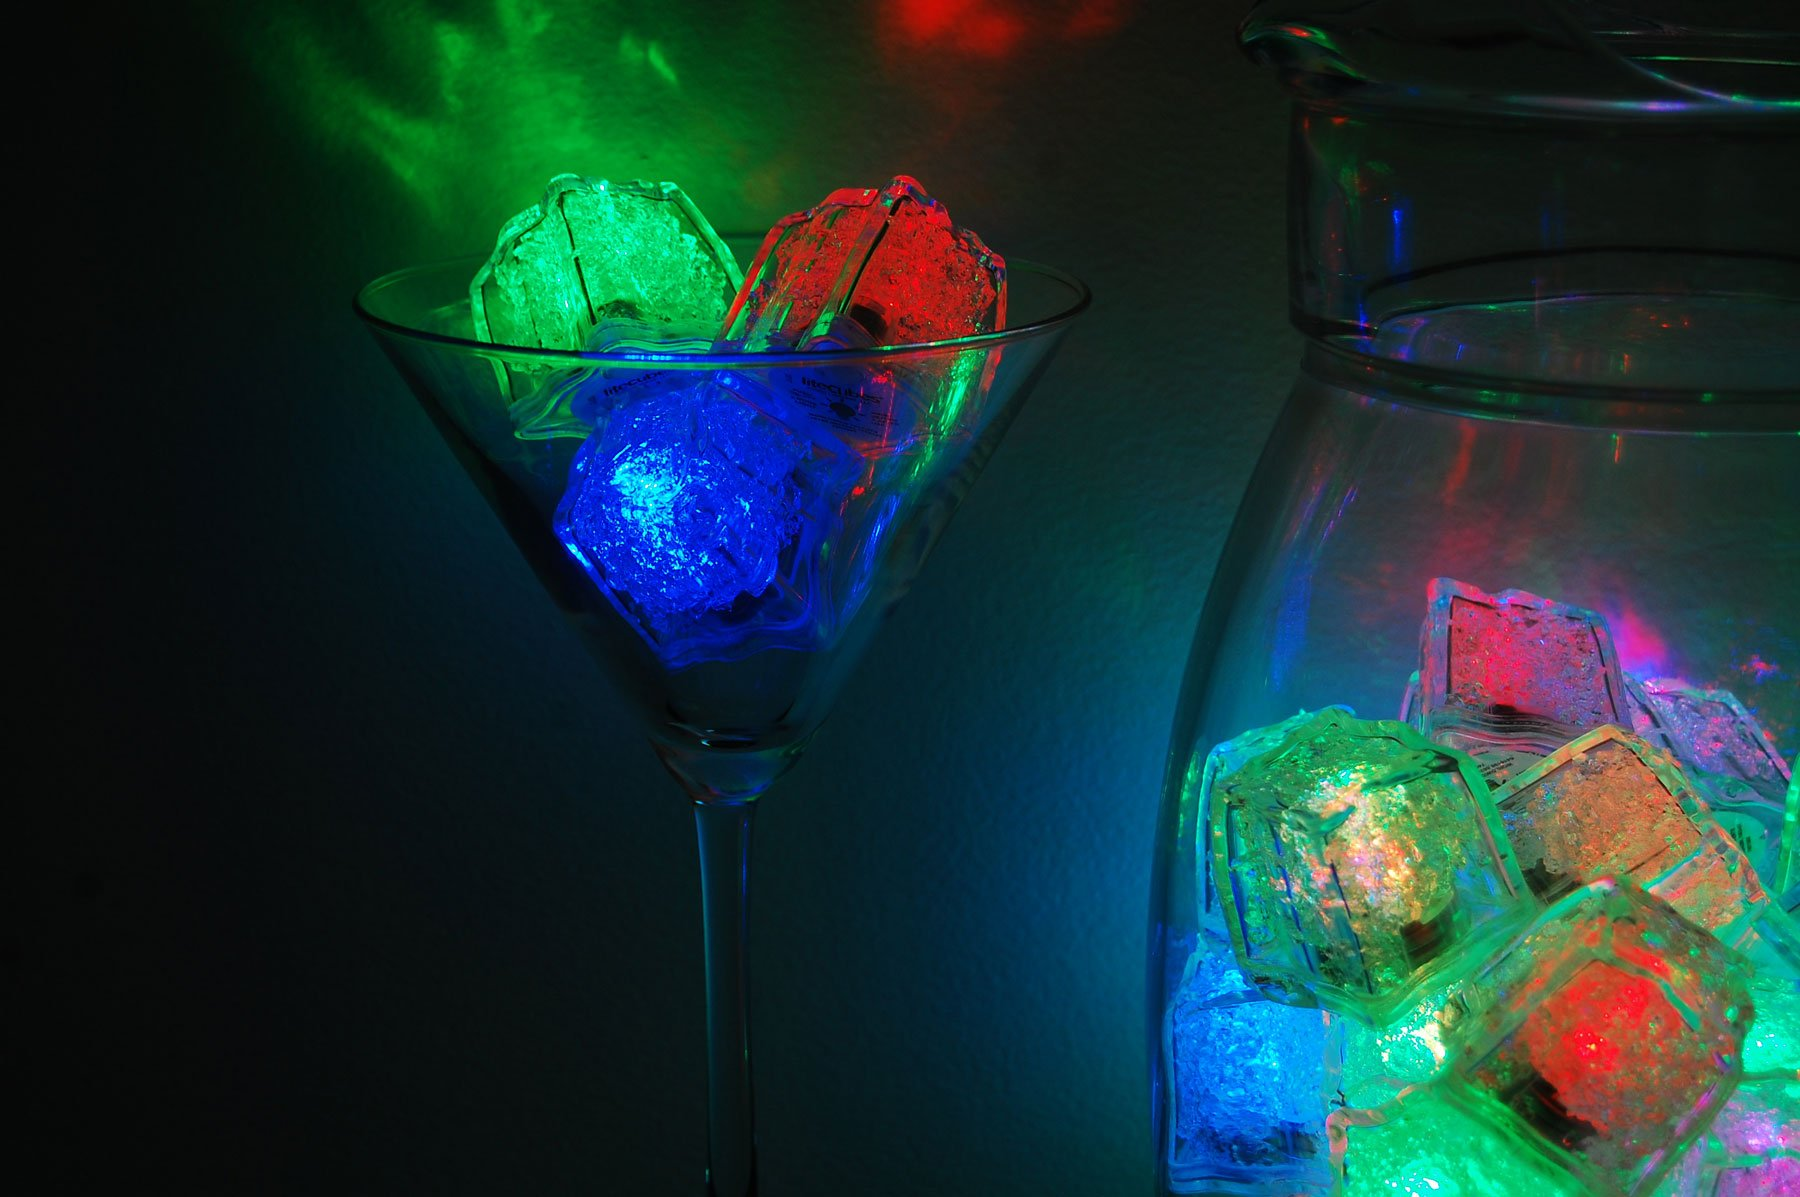 LiteCubes Set of 48 Brand 8 Mode MultiColor RAINBOW Light up LED Ice Cubes … by LiteCubes (Image #4)